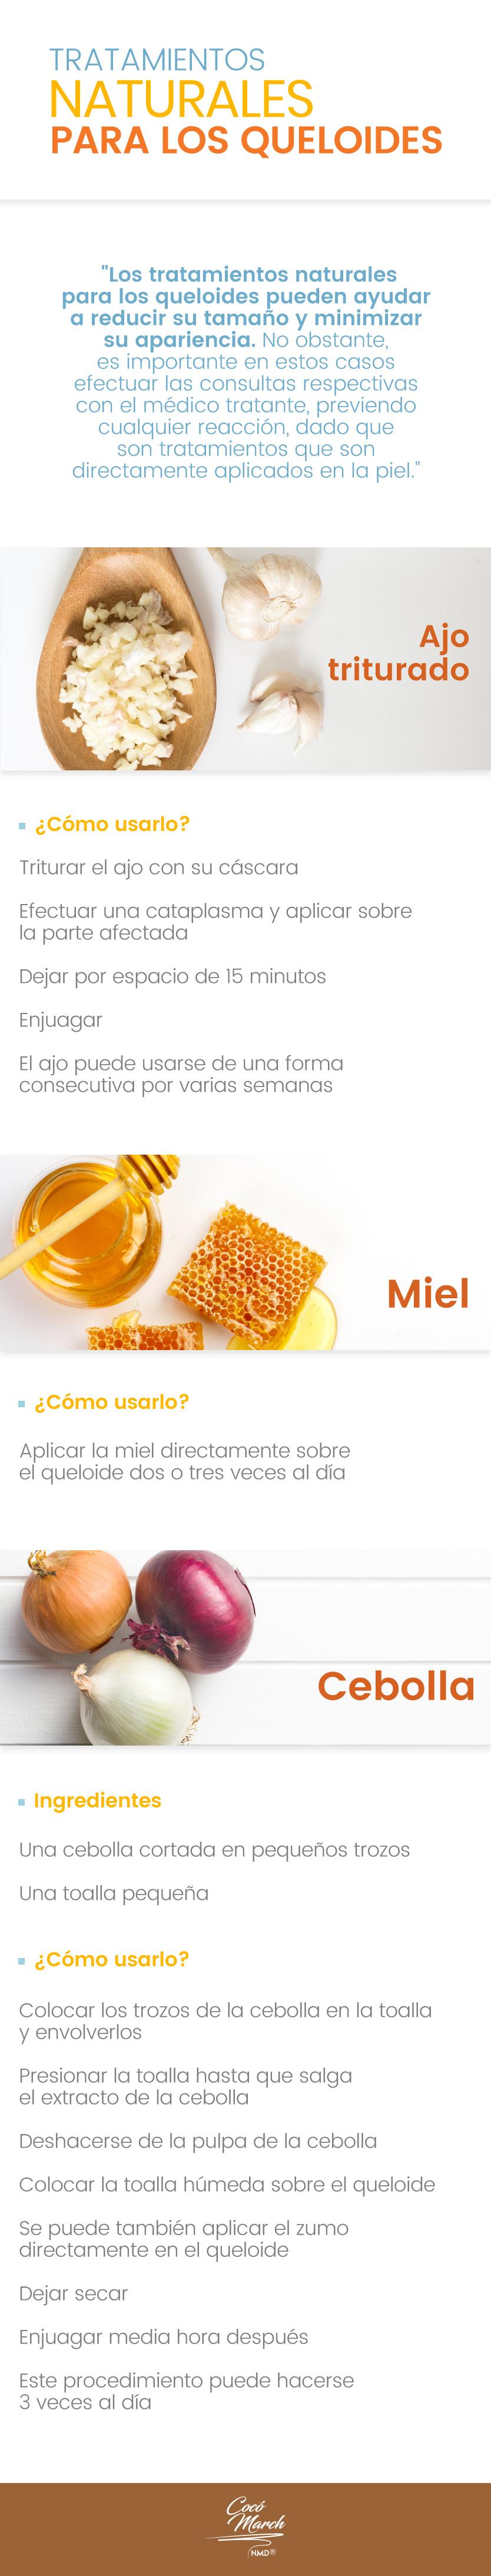 queloides-tratamientos-naturales